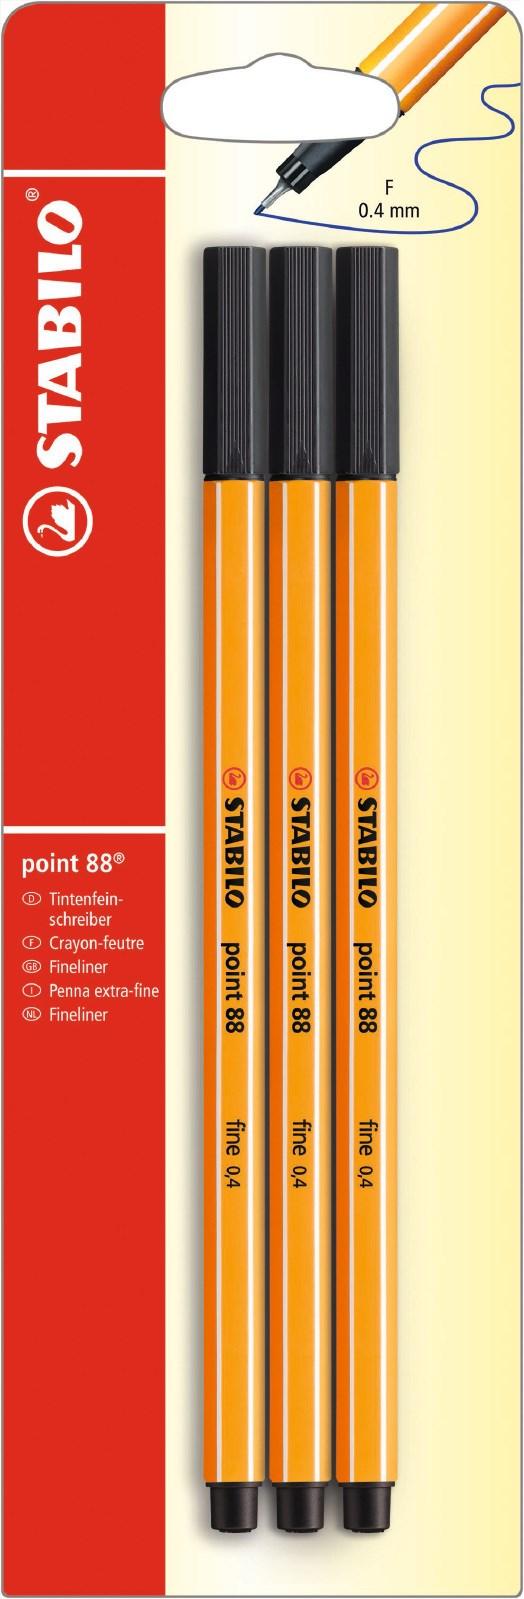 Fineliner STABILO Point 88 3-pack, Svart